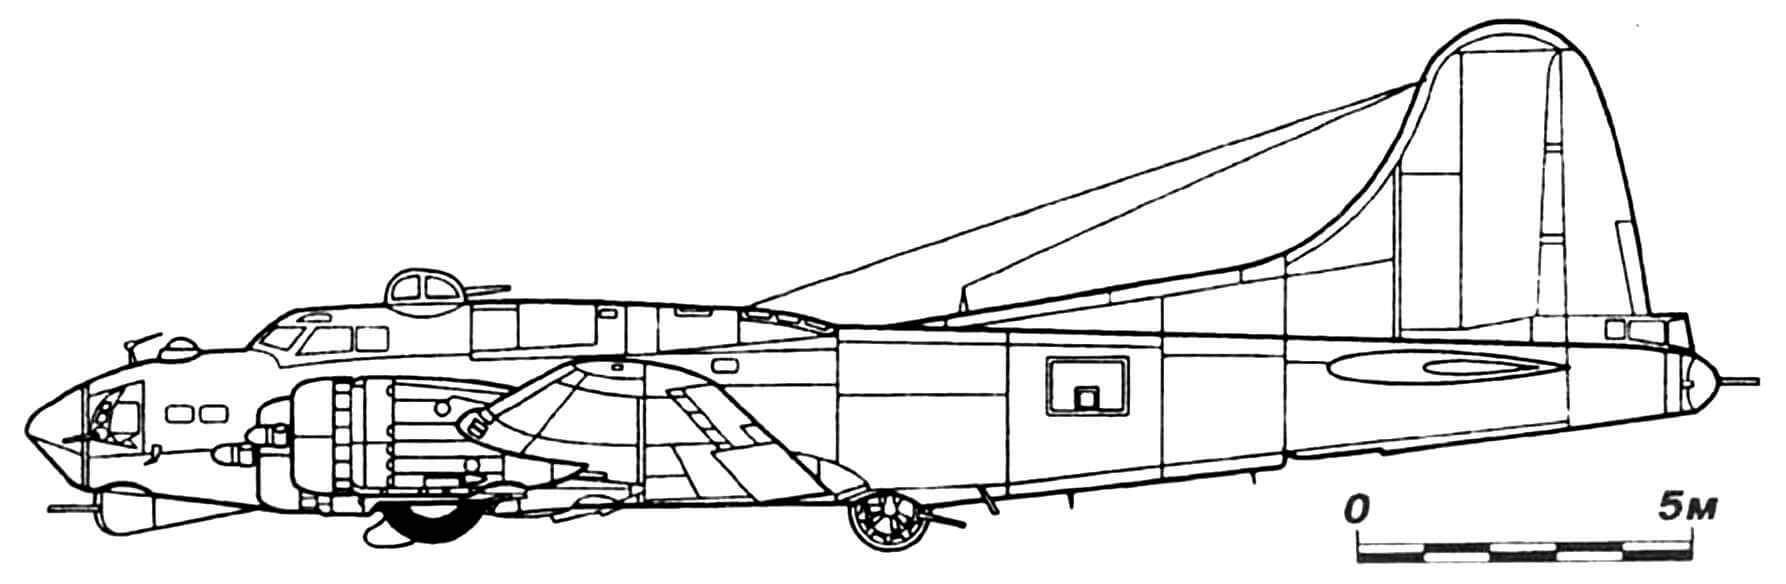 B-17G с хвостовой башней Cheyenne